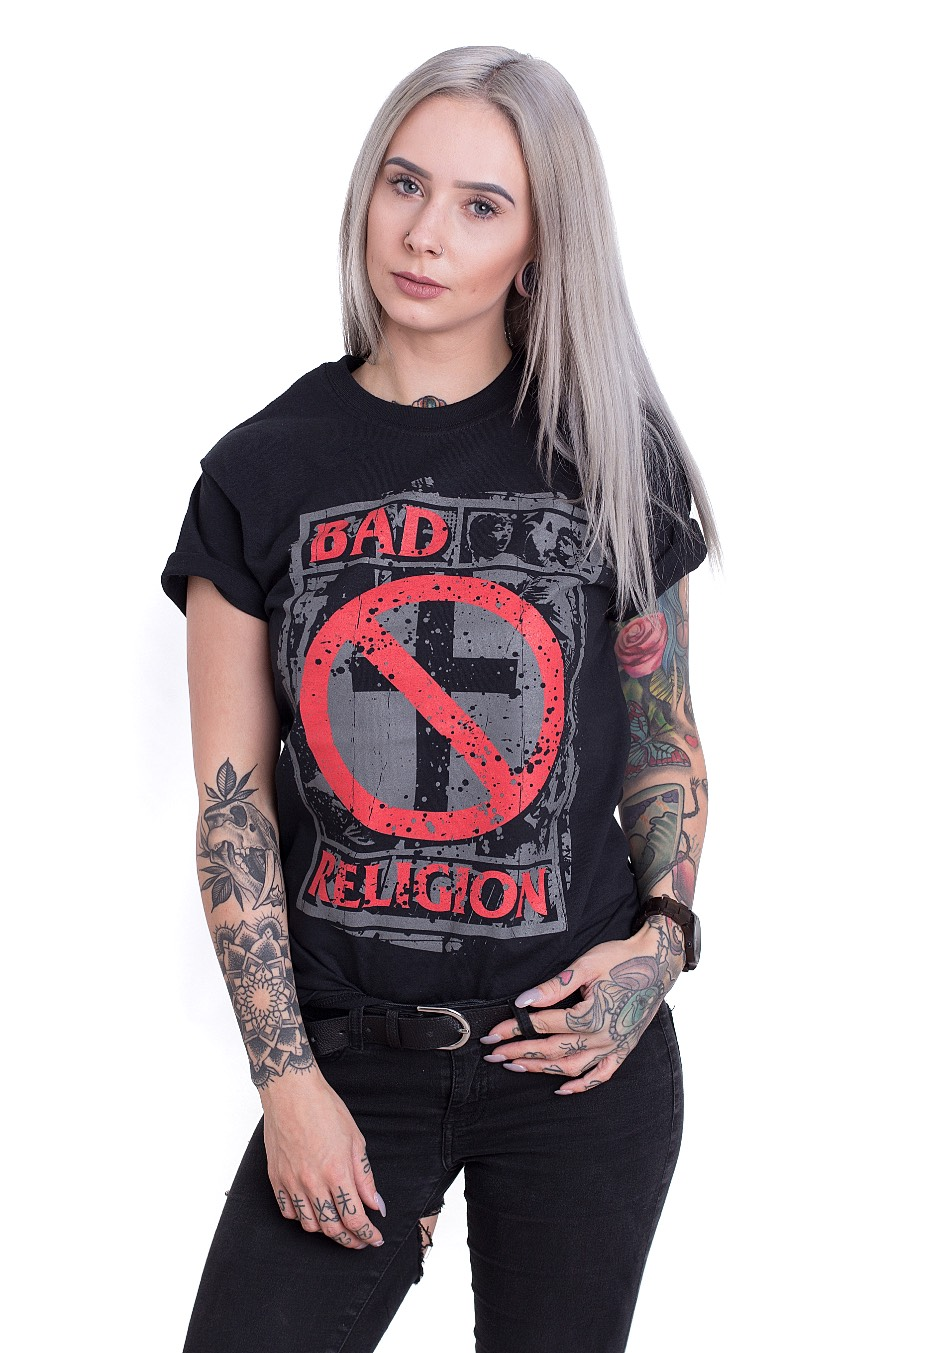 Unrest T-shirt T-shirts Kleidung & Accessoires Bad Religion